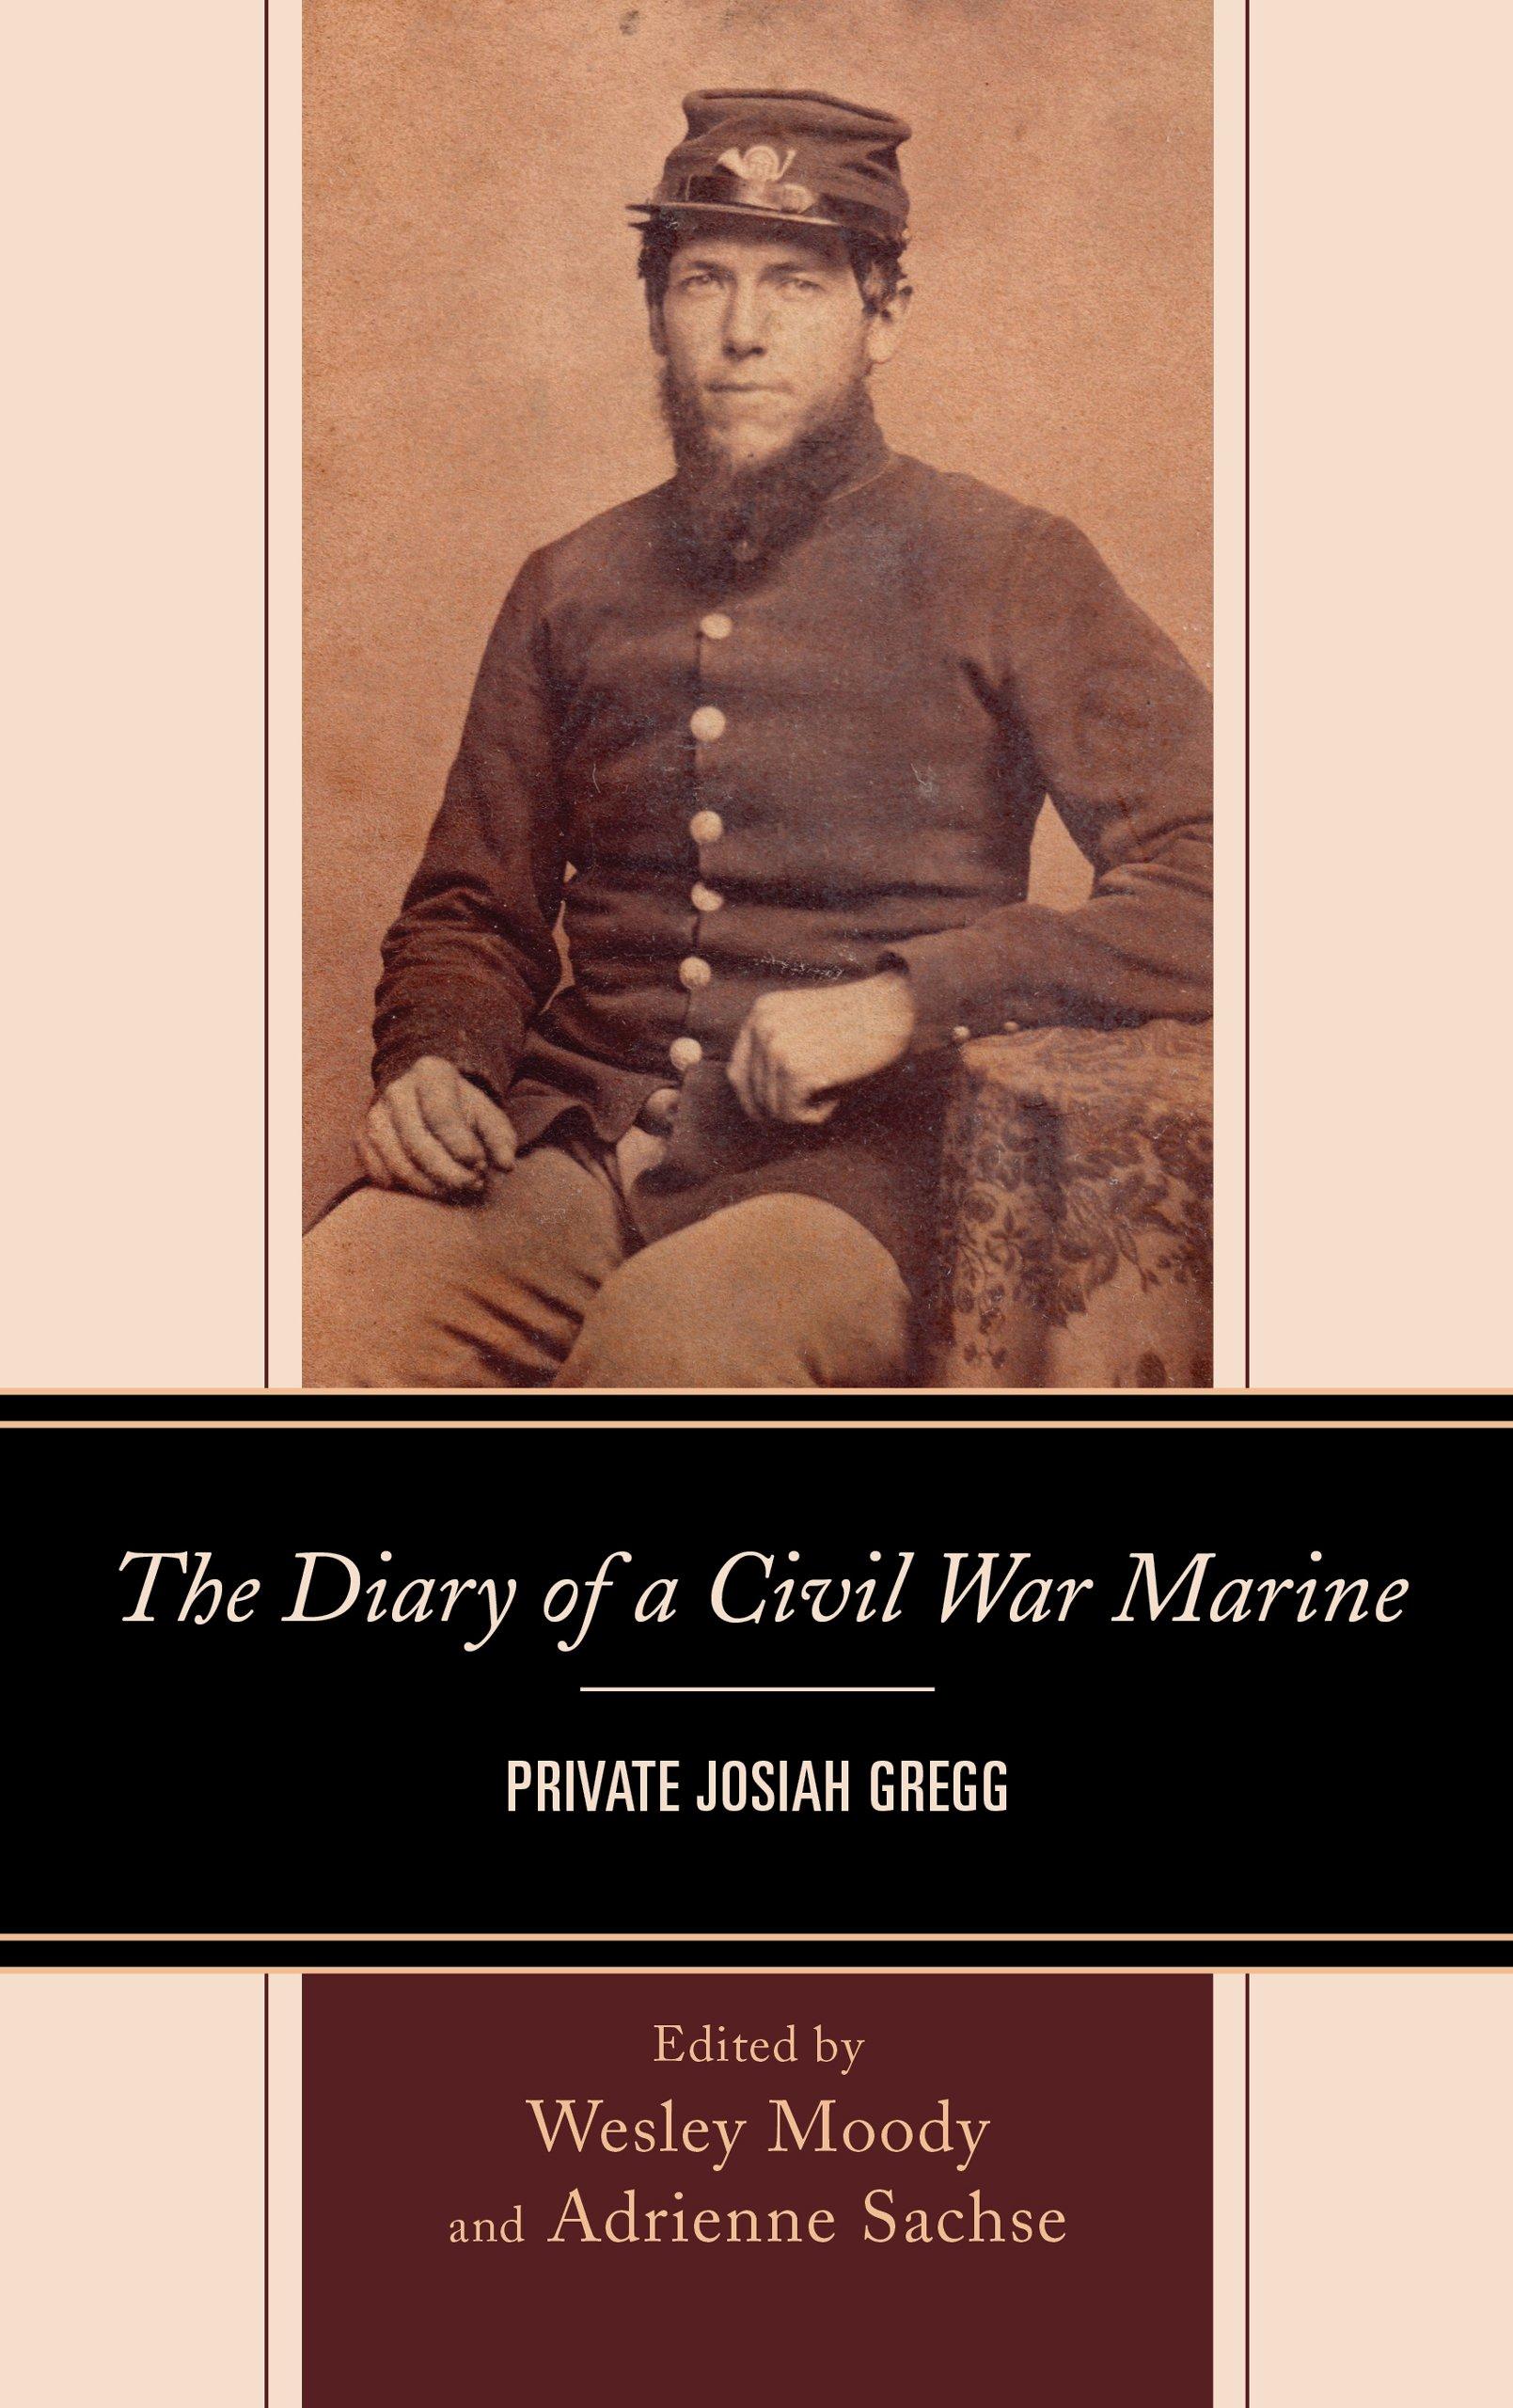 The Diary of a Civil War Marine: Private Josiah Gregg